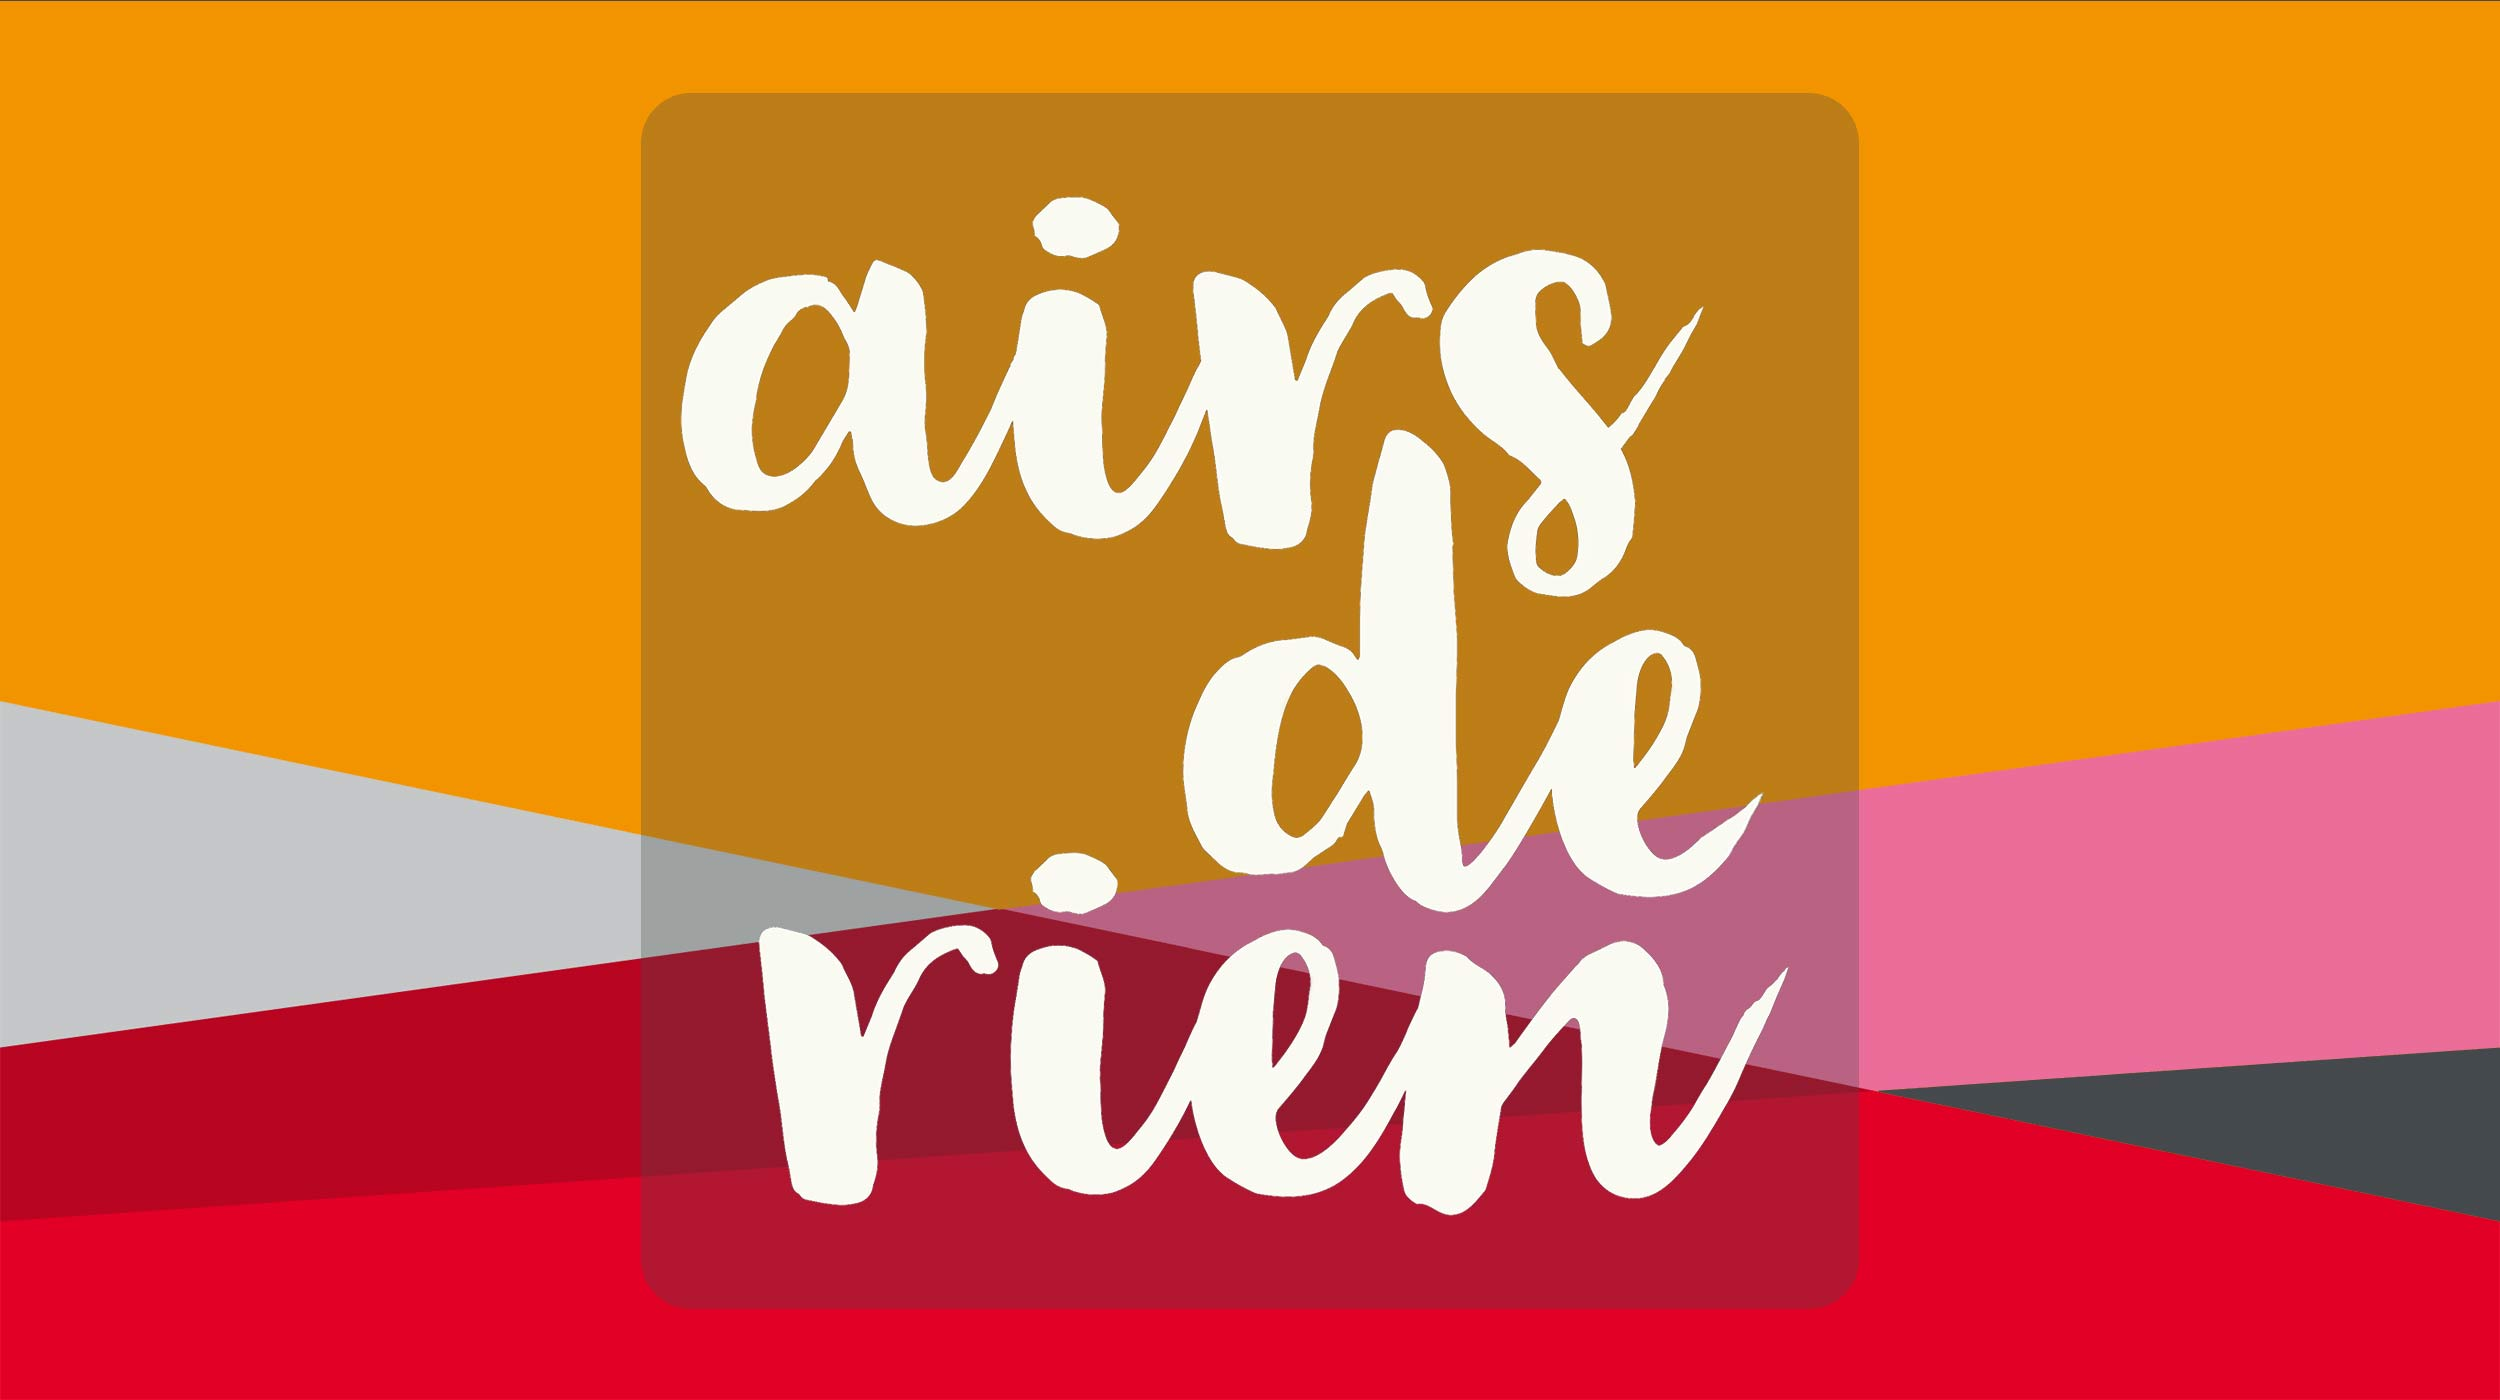 Logo Airs de rien. Pascal Bernheim [RTS]